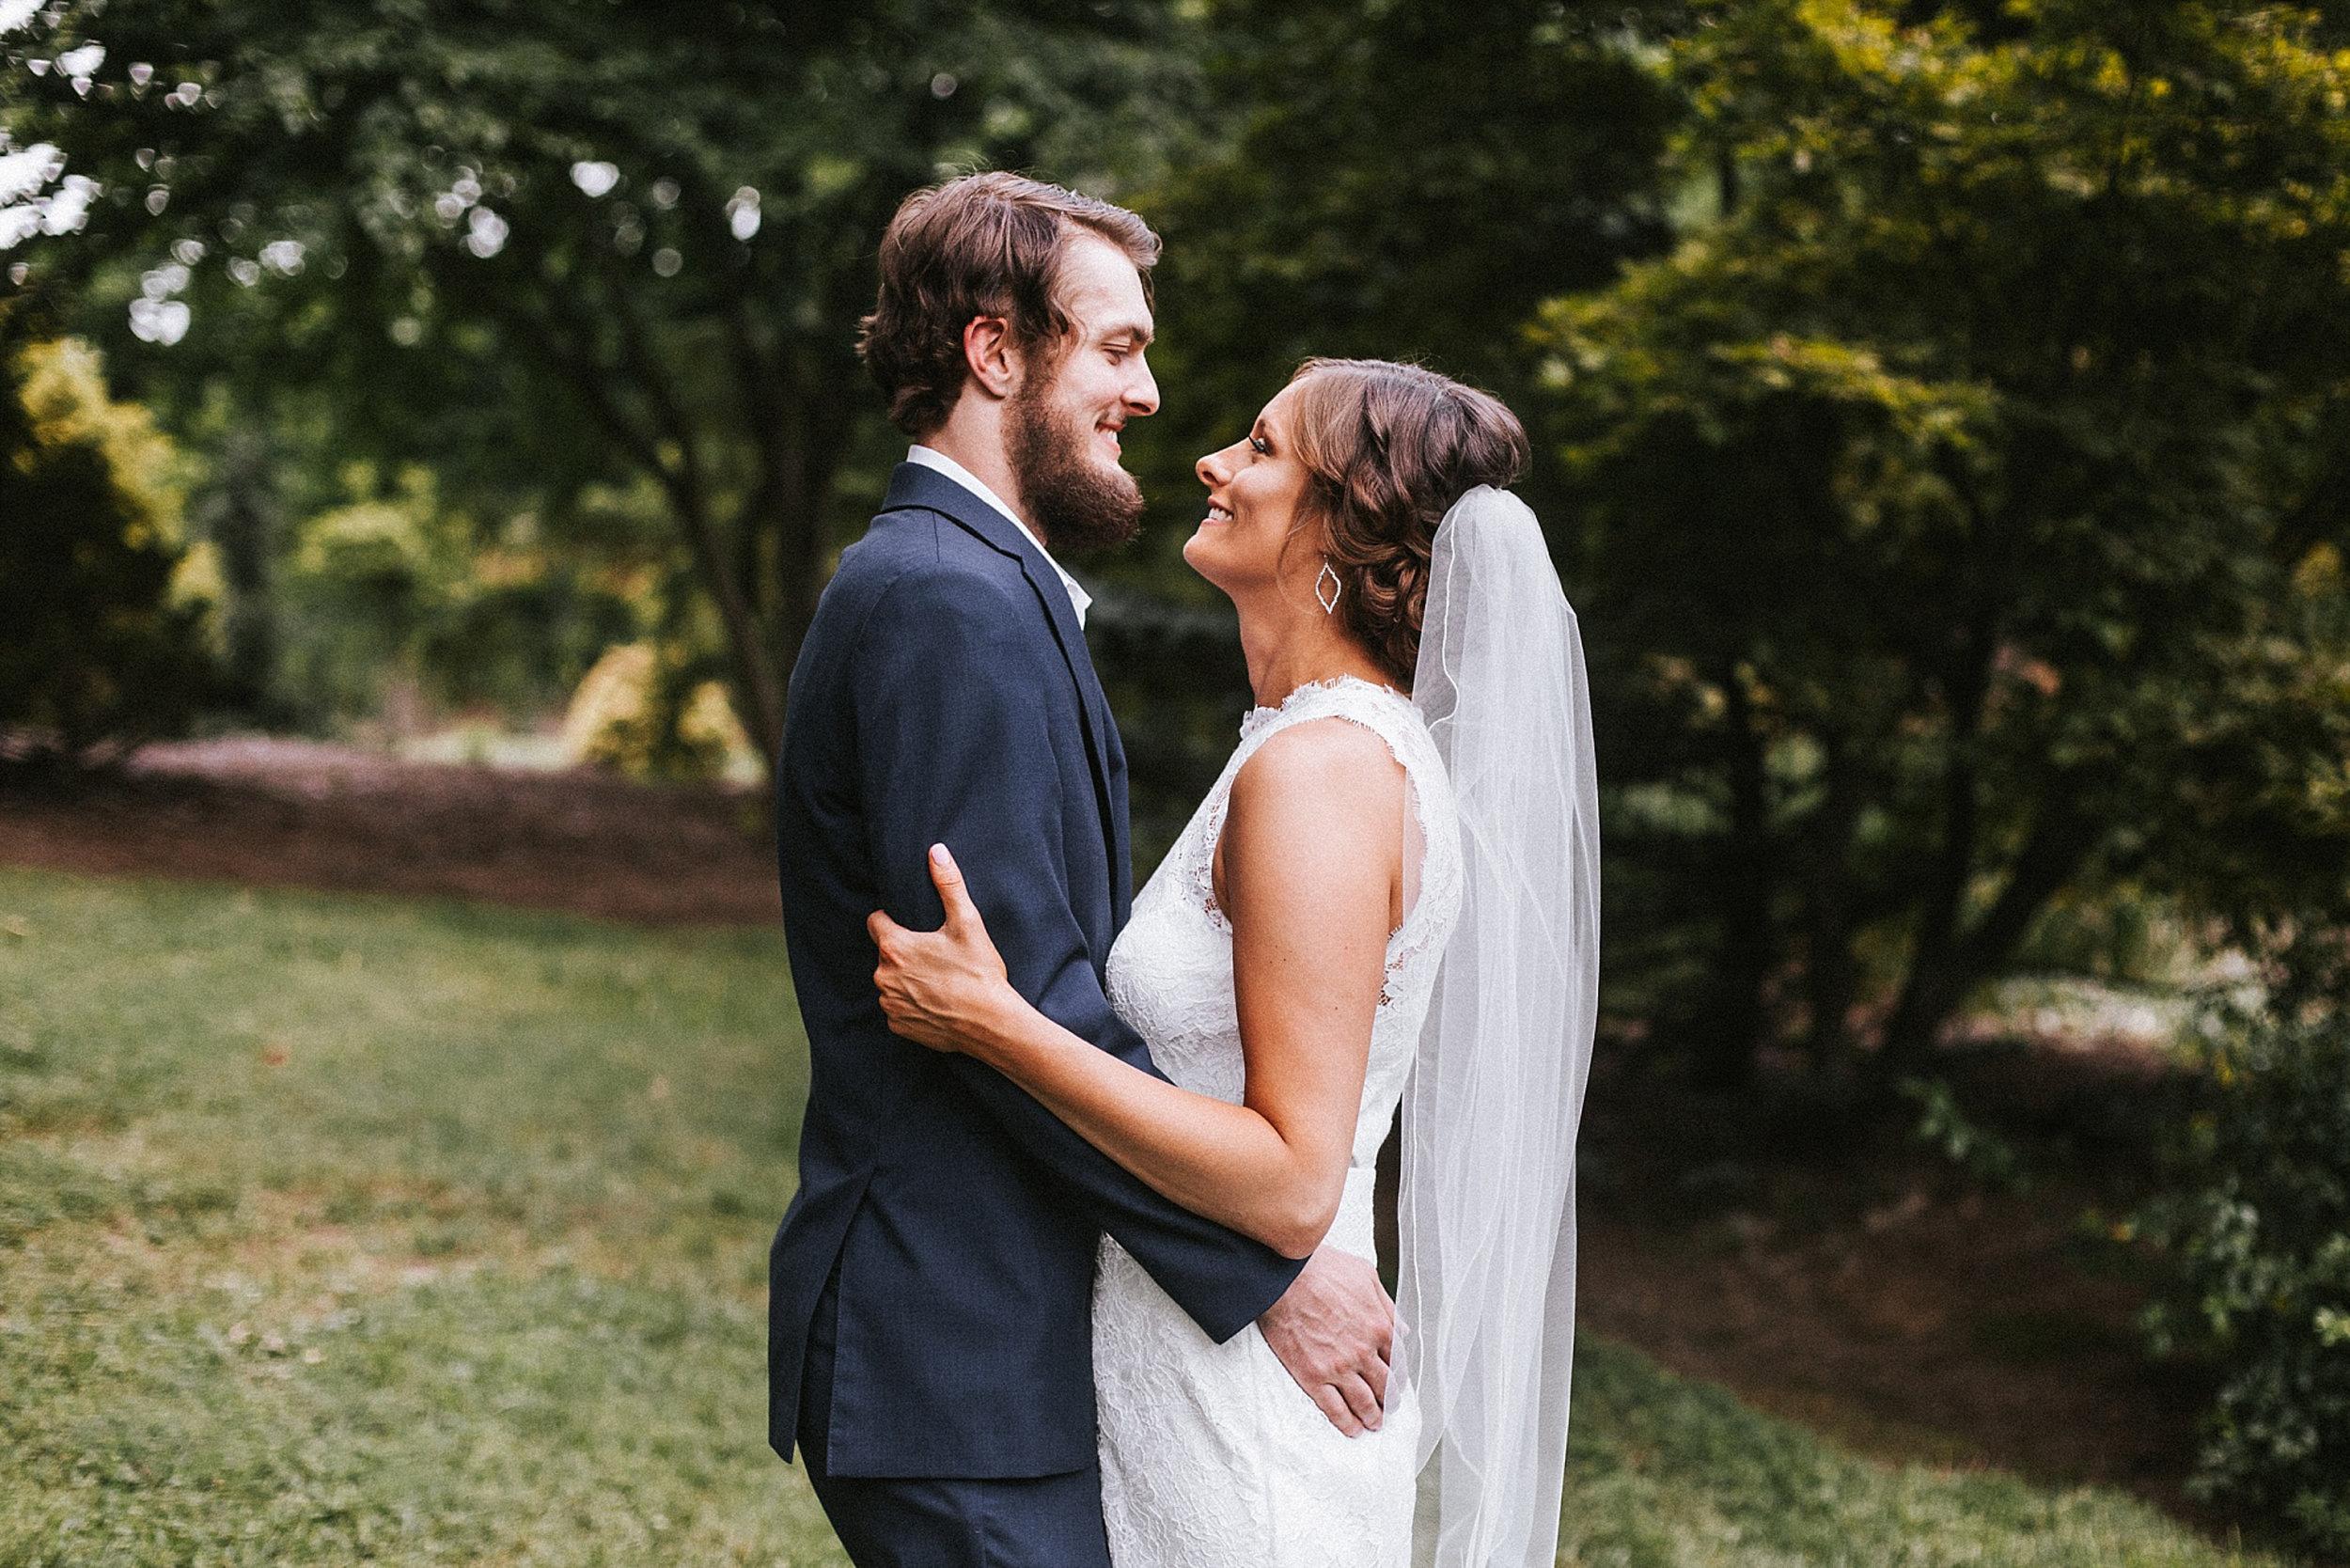 Brooke Townsend Photography - Ohio Wedding Photographer (23 of 78).jpg